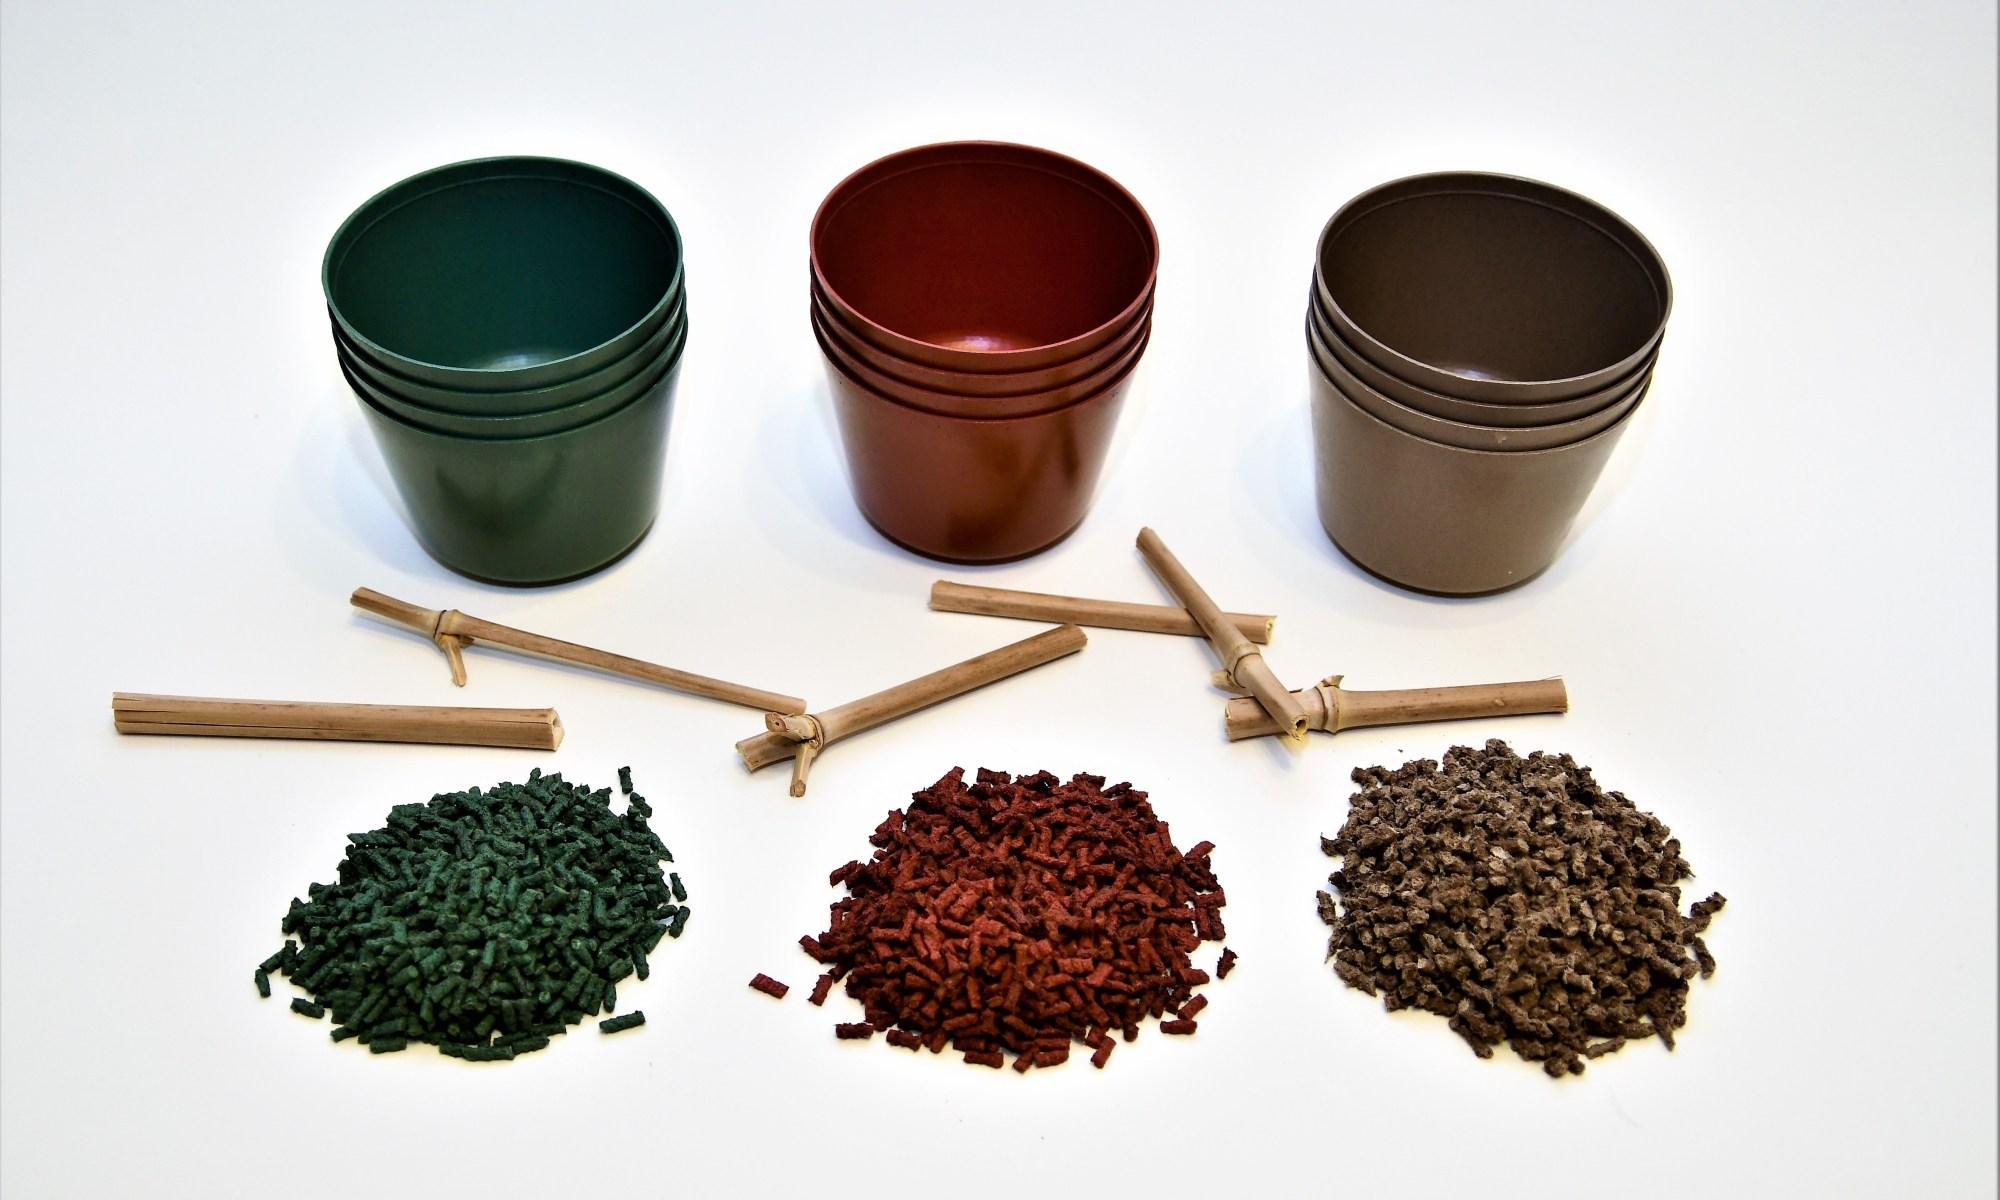 evergreen spectalite bioplastics